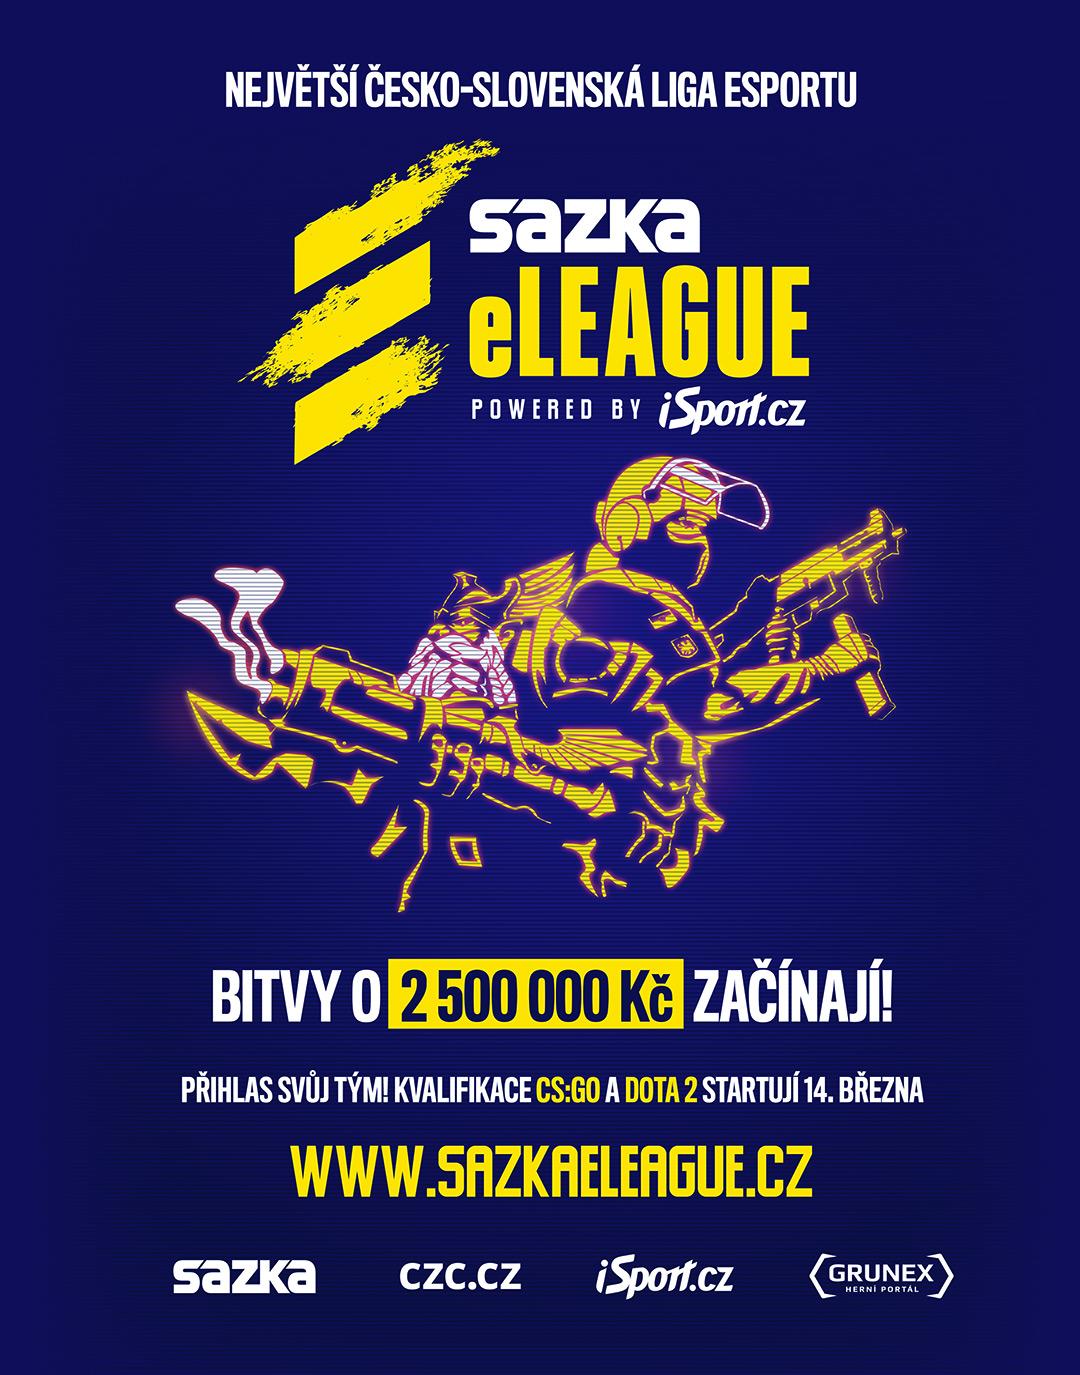 sazka-eleague_ilustrace_v1